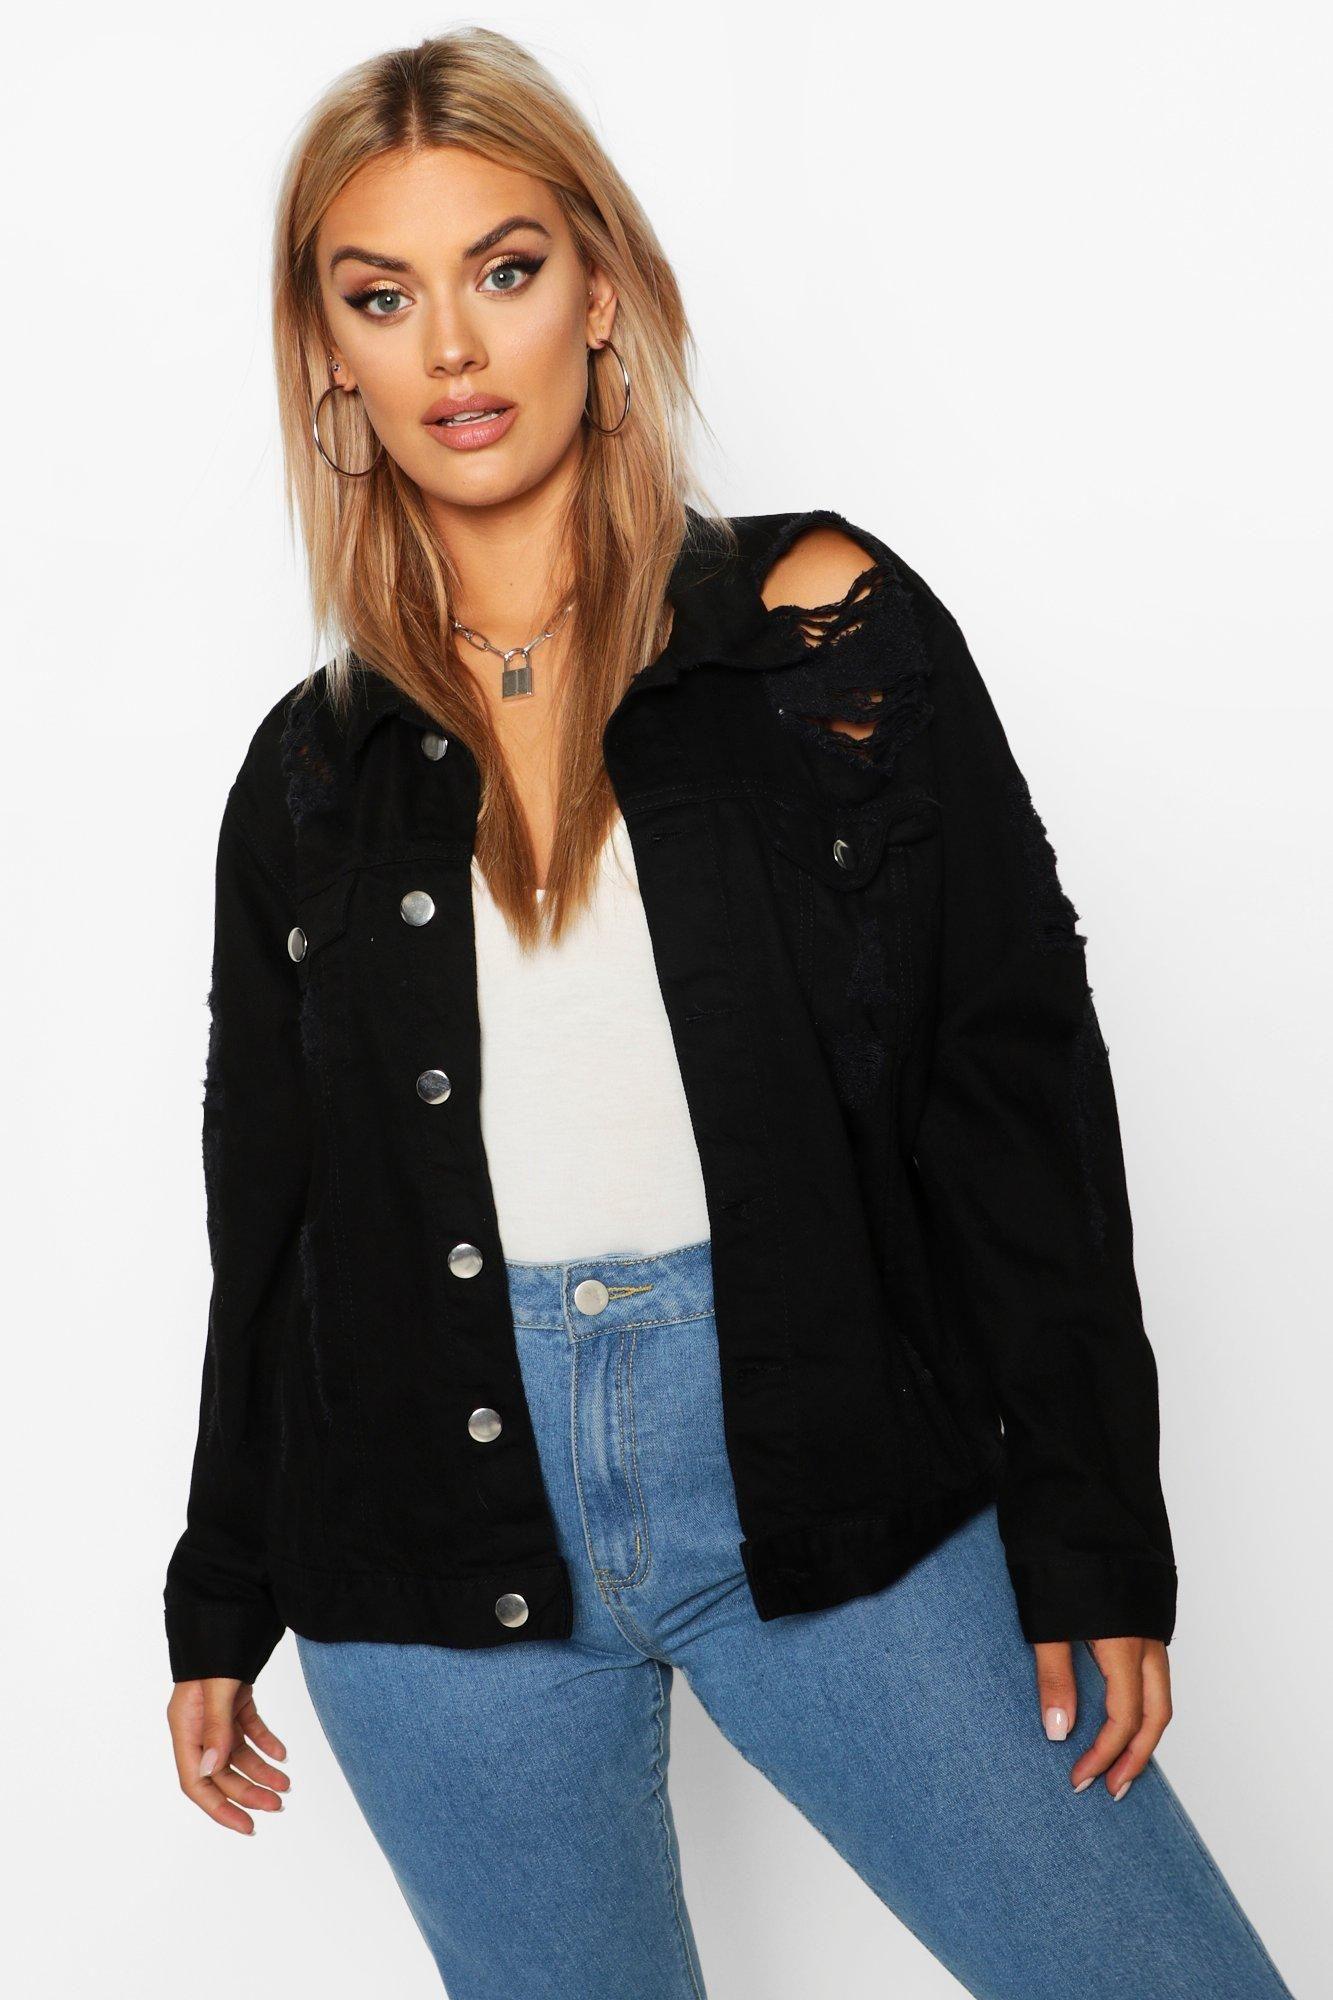 Plus Oversized Distressed Denim Jacket Boohoo Oversized Distressed Denim Jacket Jacket Outfit Women Denim Jacket [ 2000 x 1333 Pixel ]